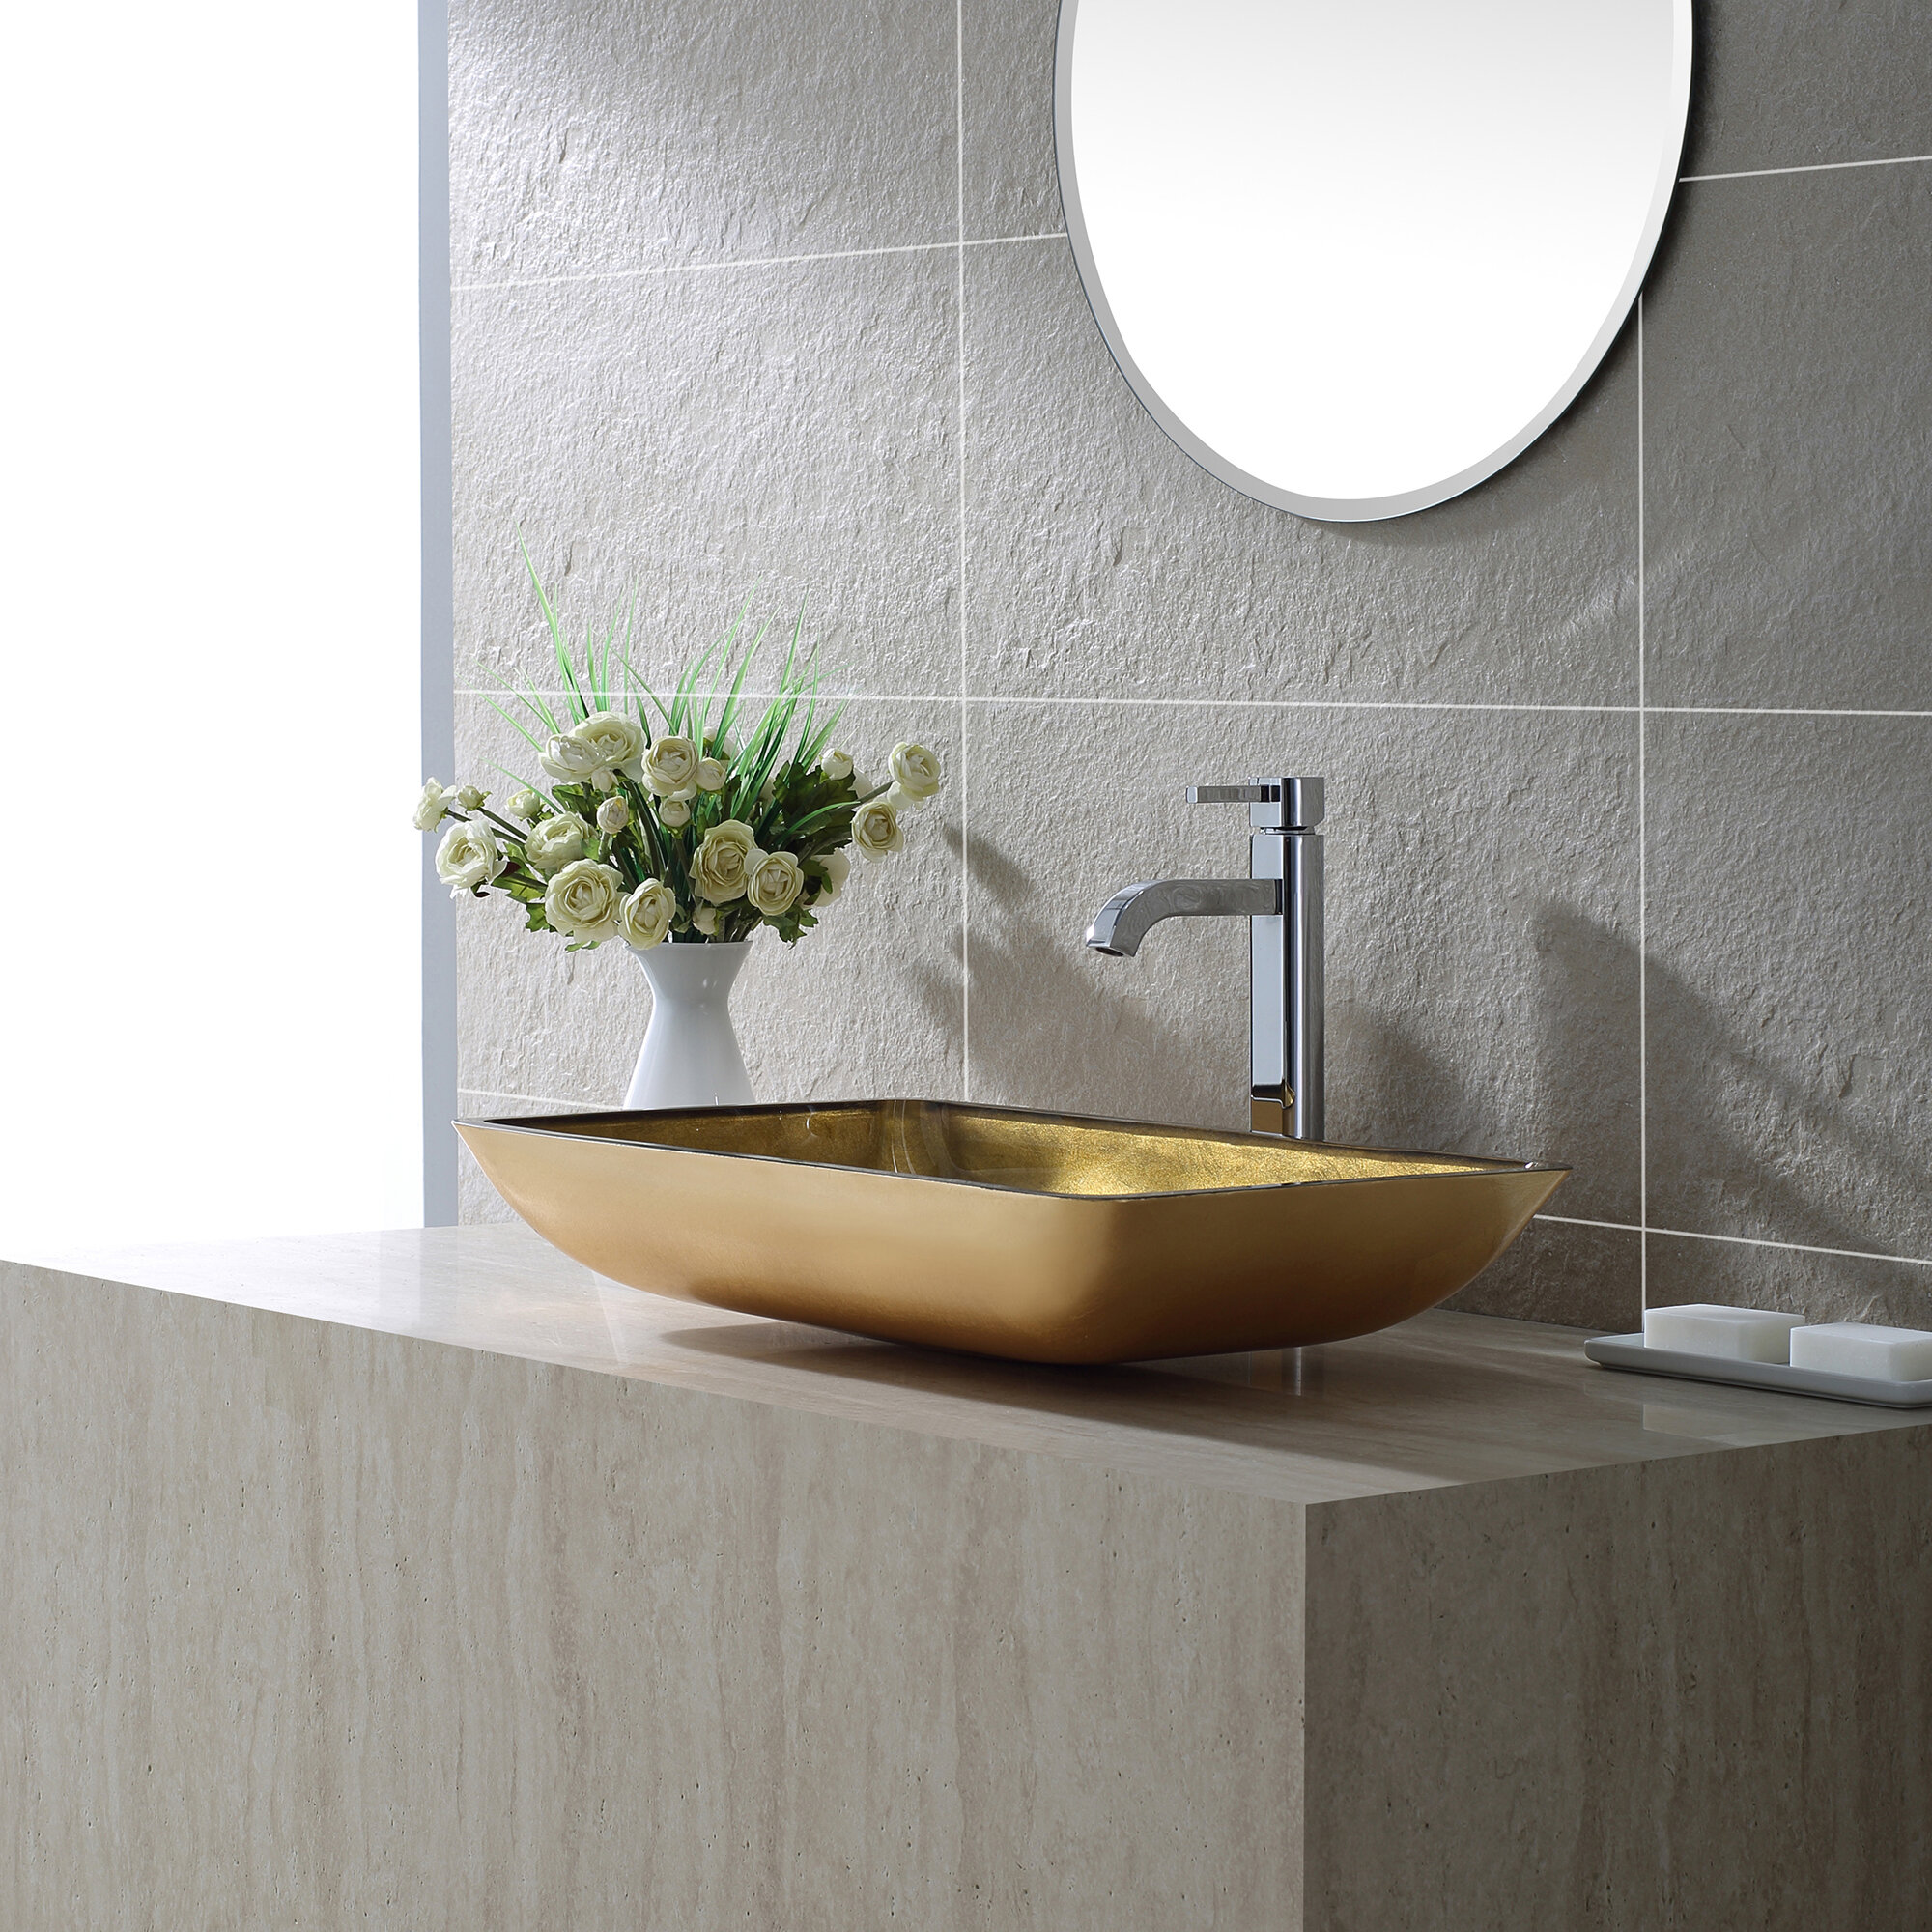 vessel single improvement sink and sinks faucets kraus pdx faucet bathroom handle reviews ramus home wayfair